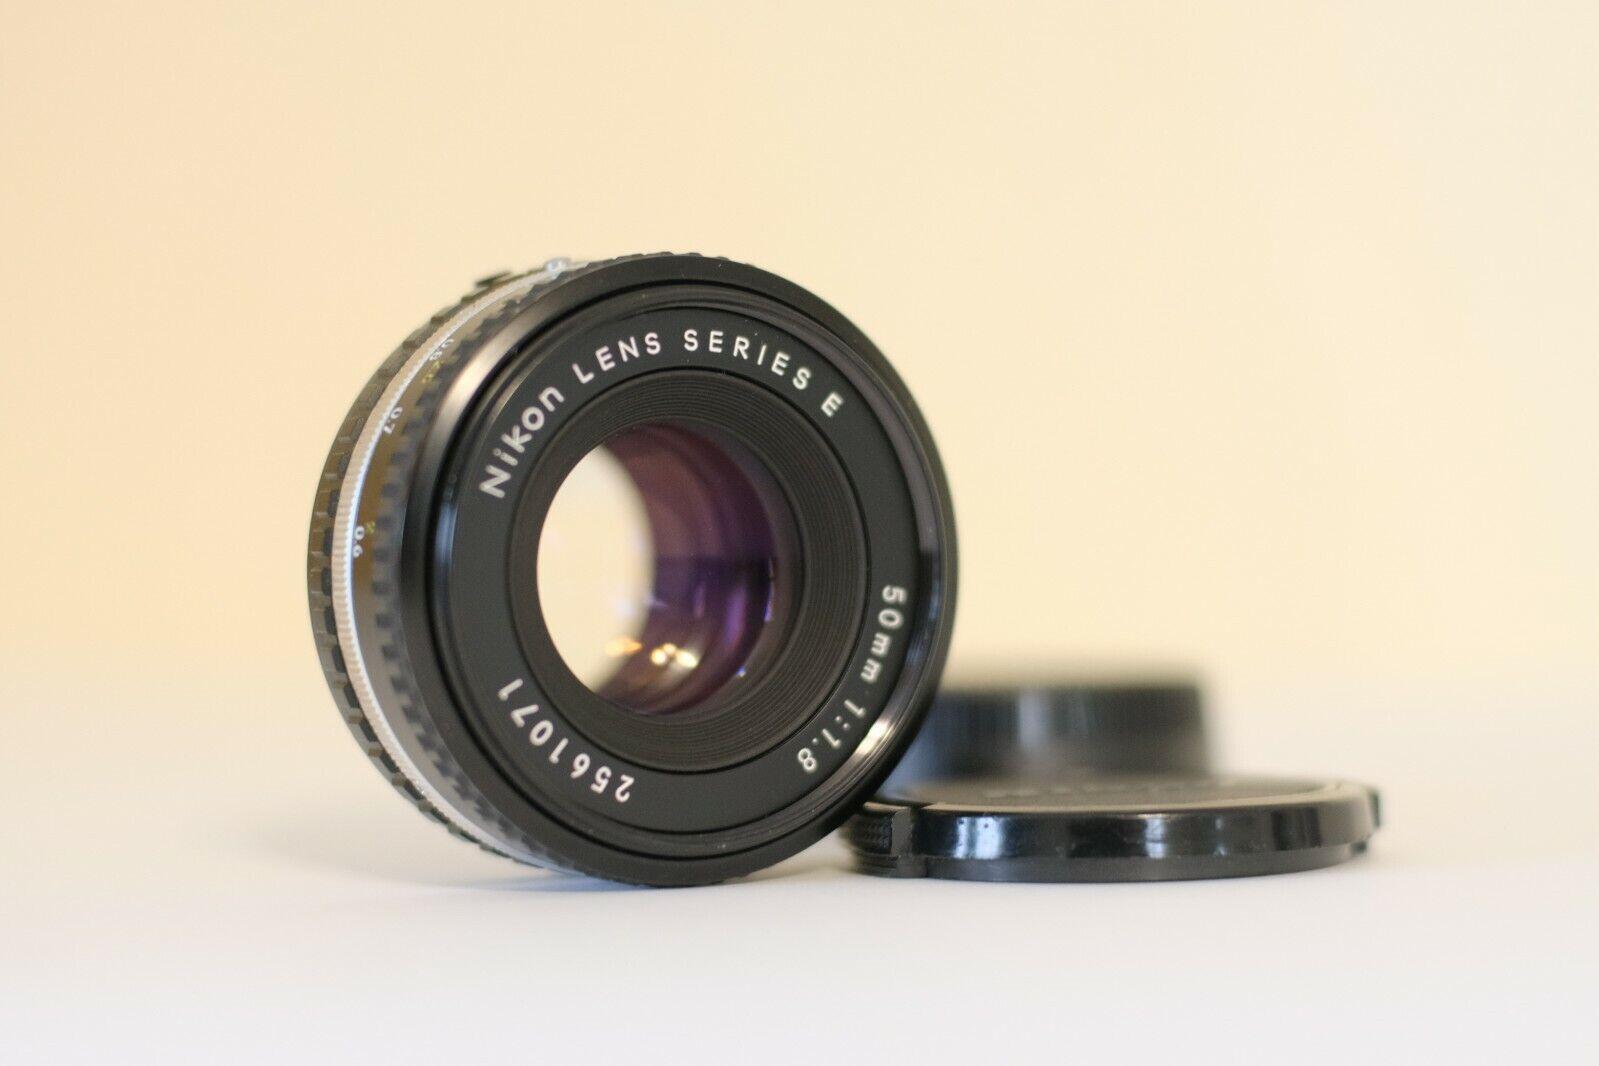 Nikon Nikkor 50mm F/1.8 Series E AIS Manual Focus Lens BEAUTIFUL - $99.00